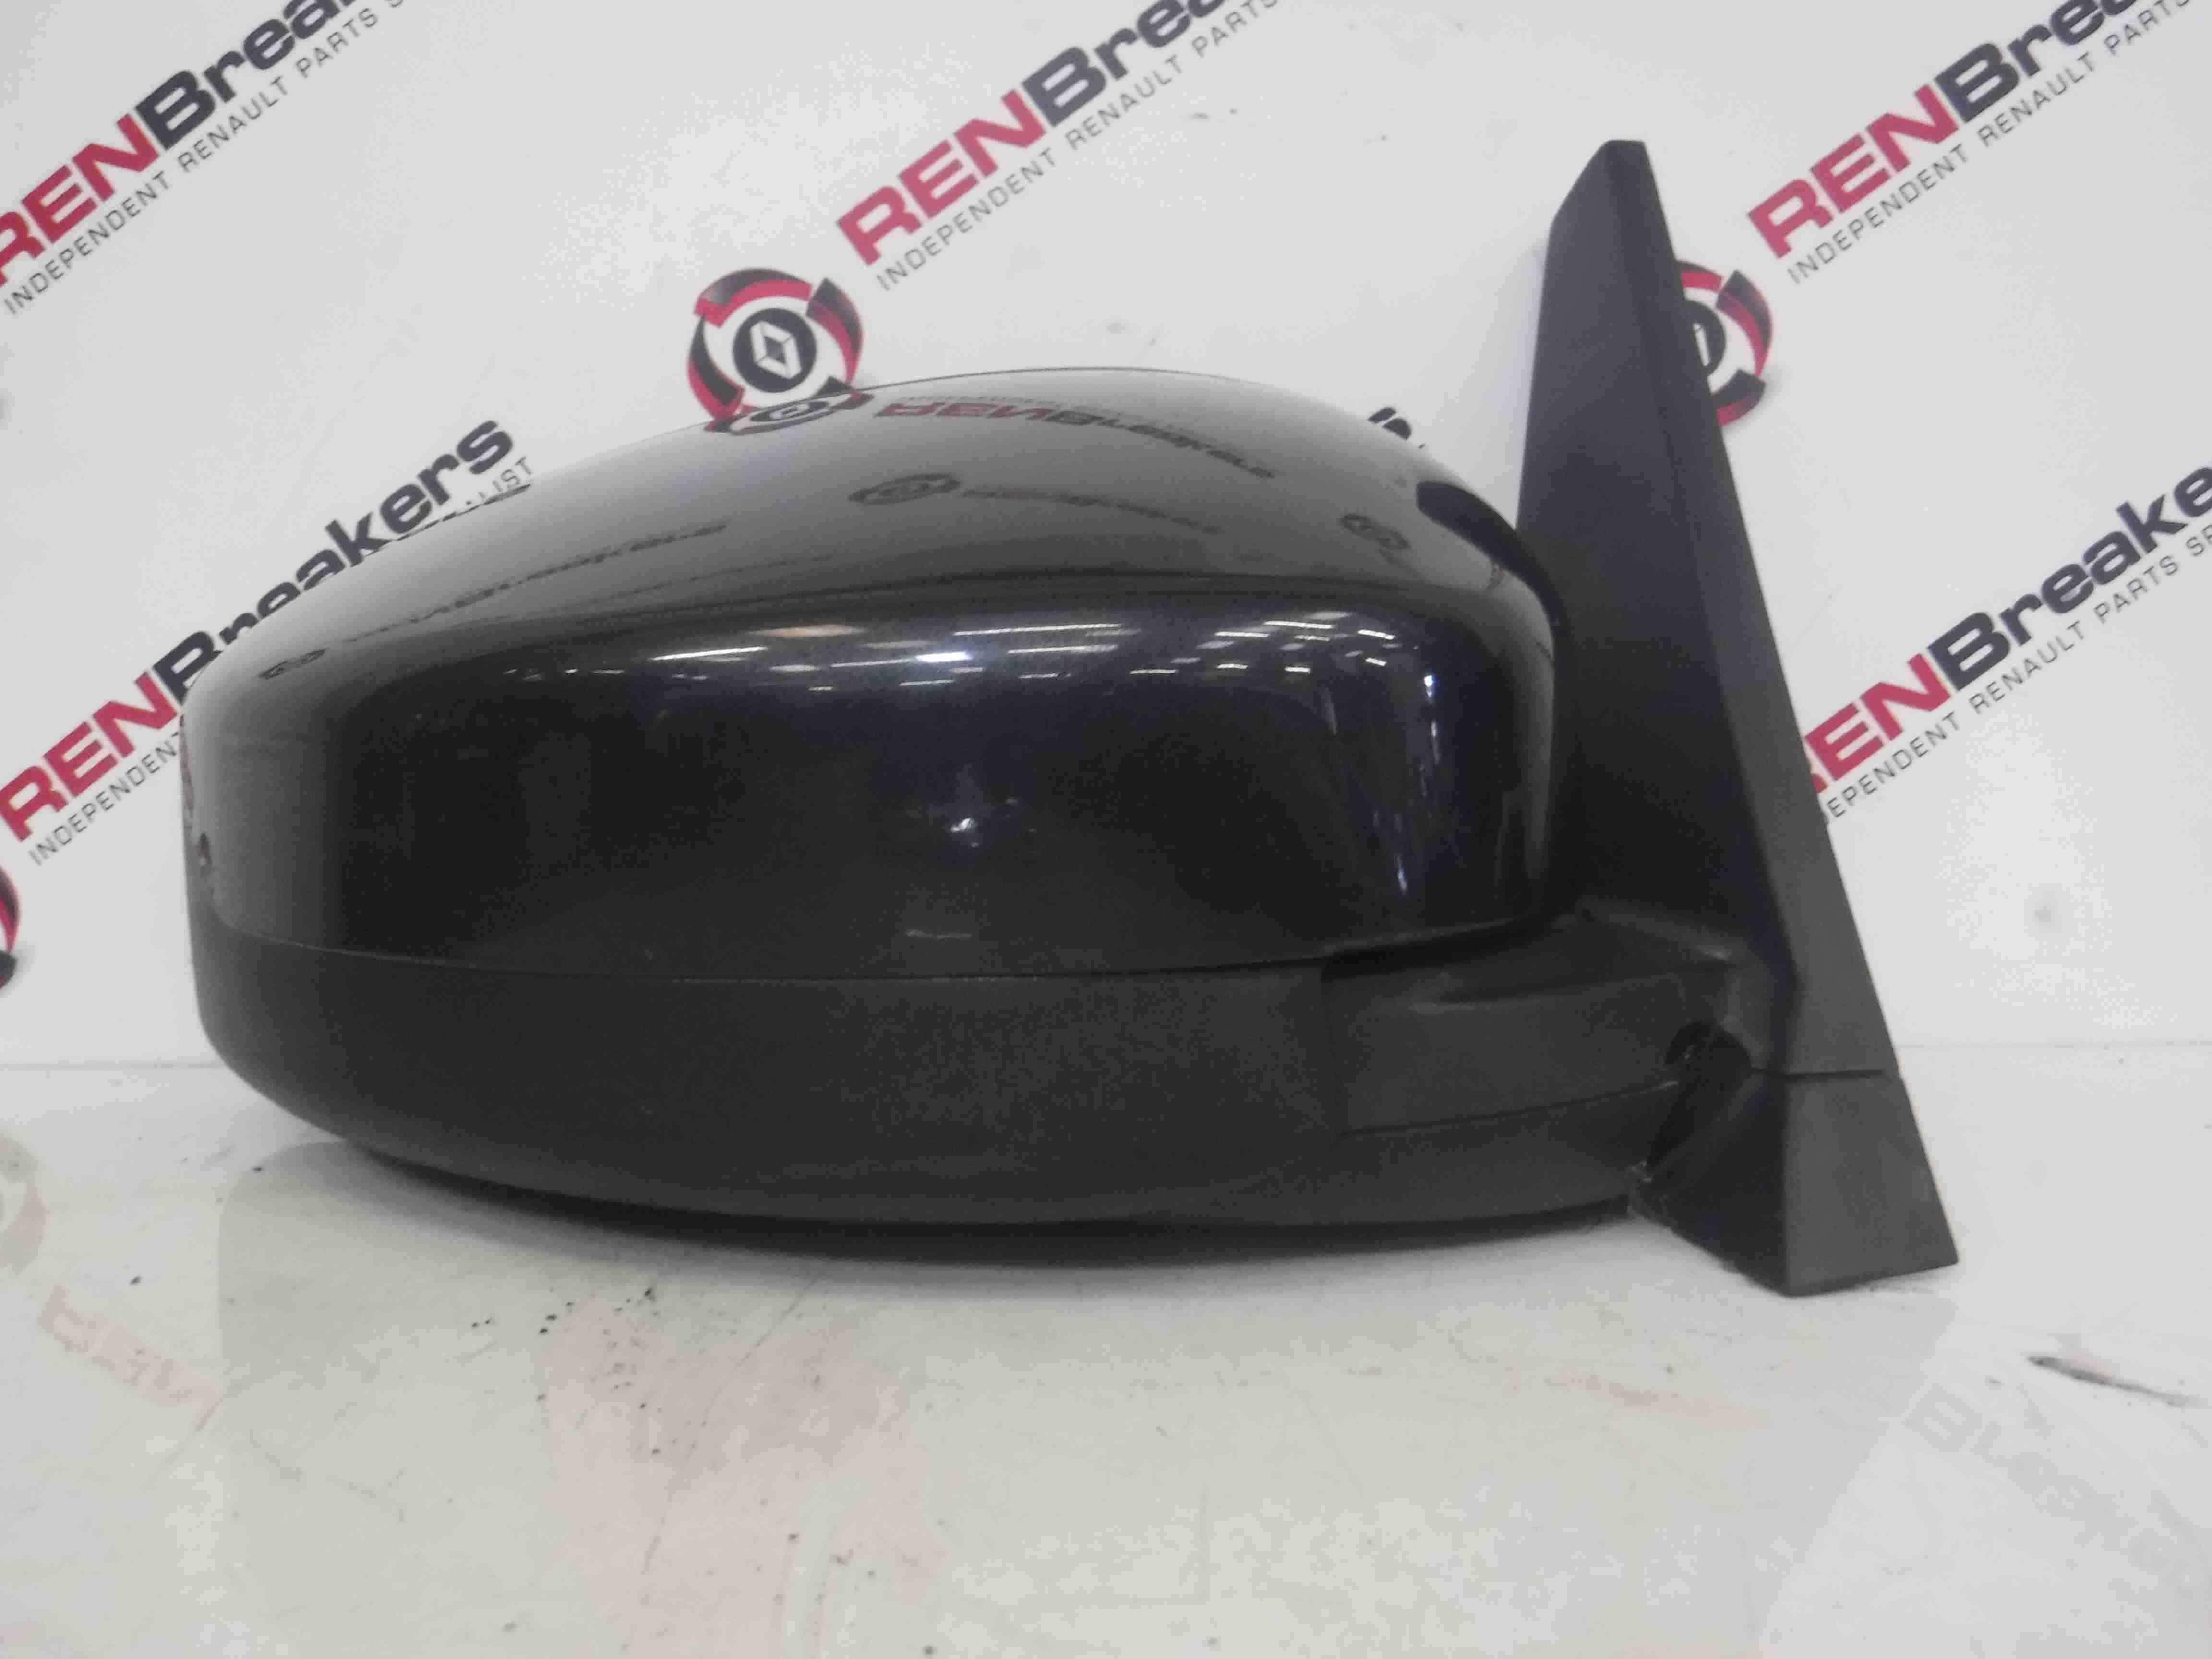 Renault Espace 2003-2013 Drivers OS Wing Mirror Grey TEB66 Folding